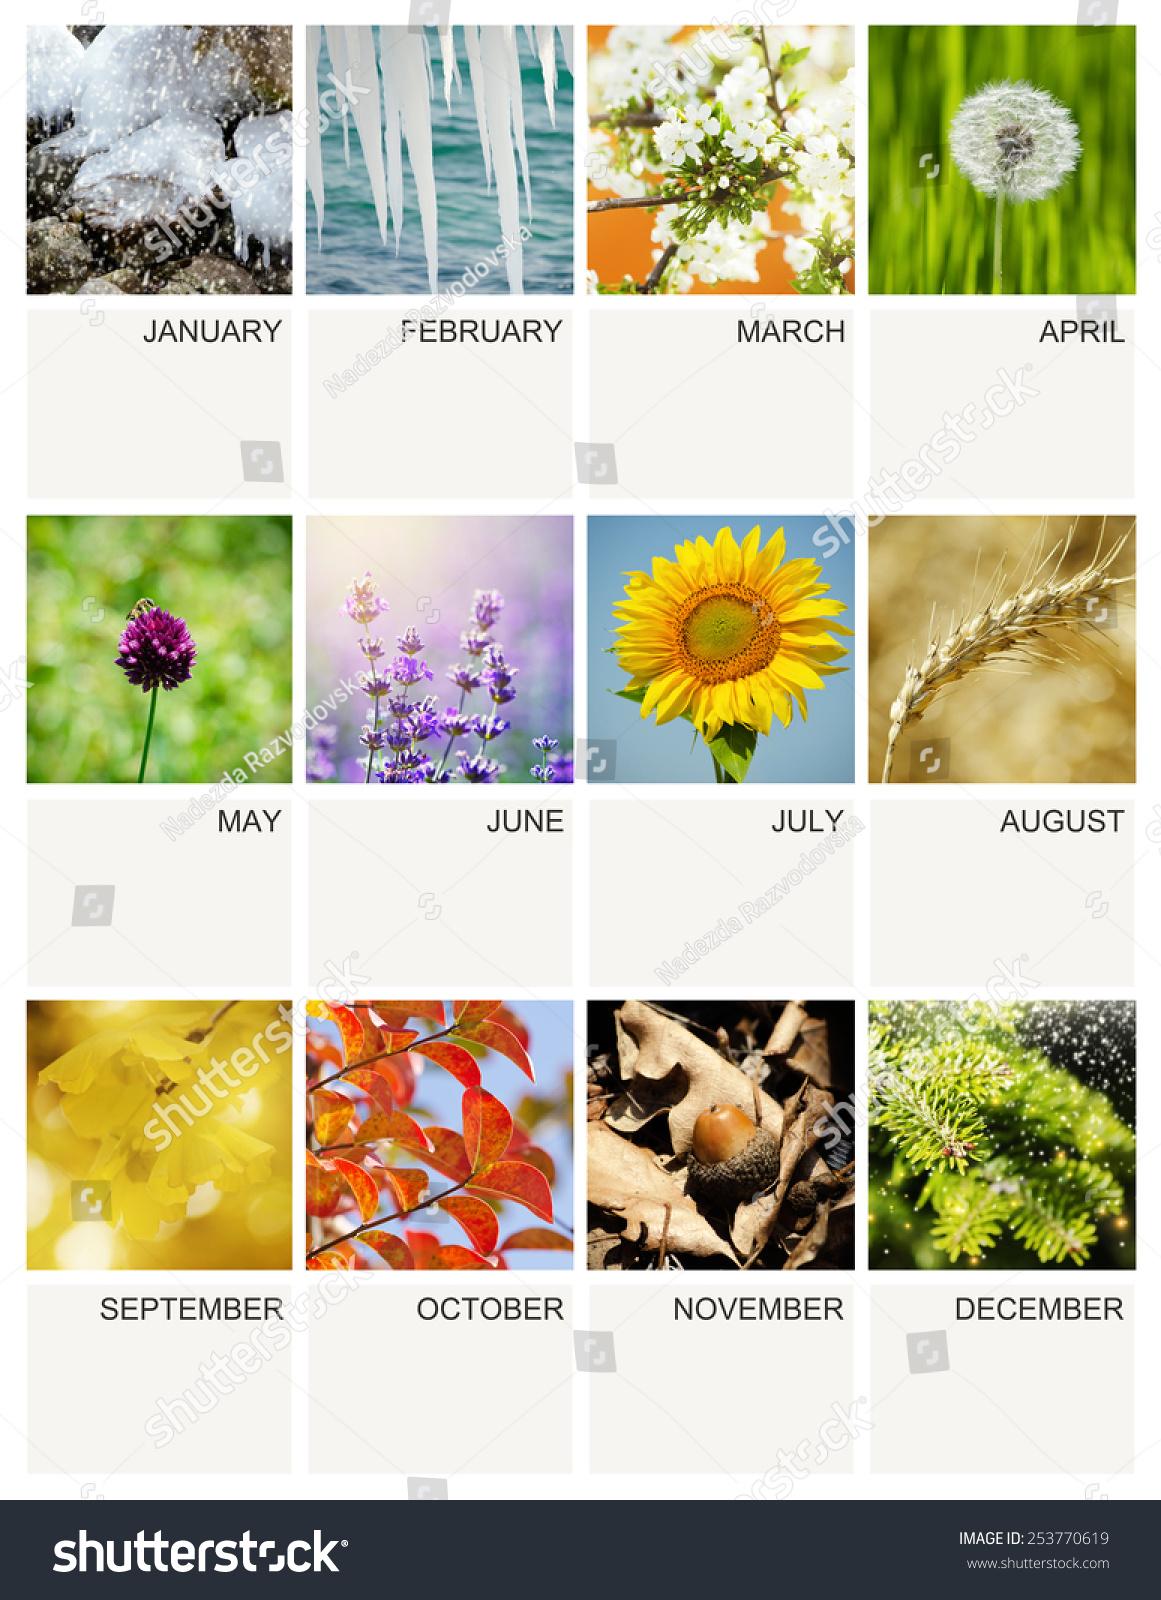 Every Year Calendar : Empty every year calendar template with seasonal my own